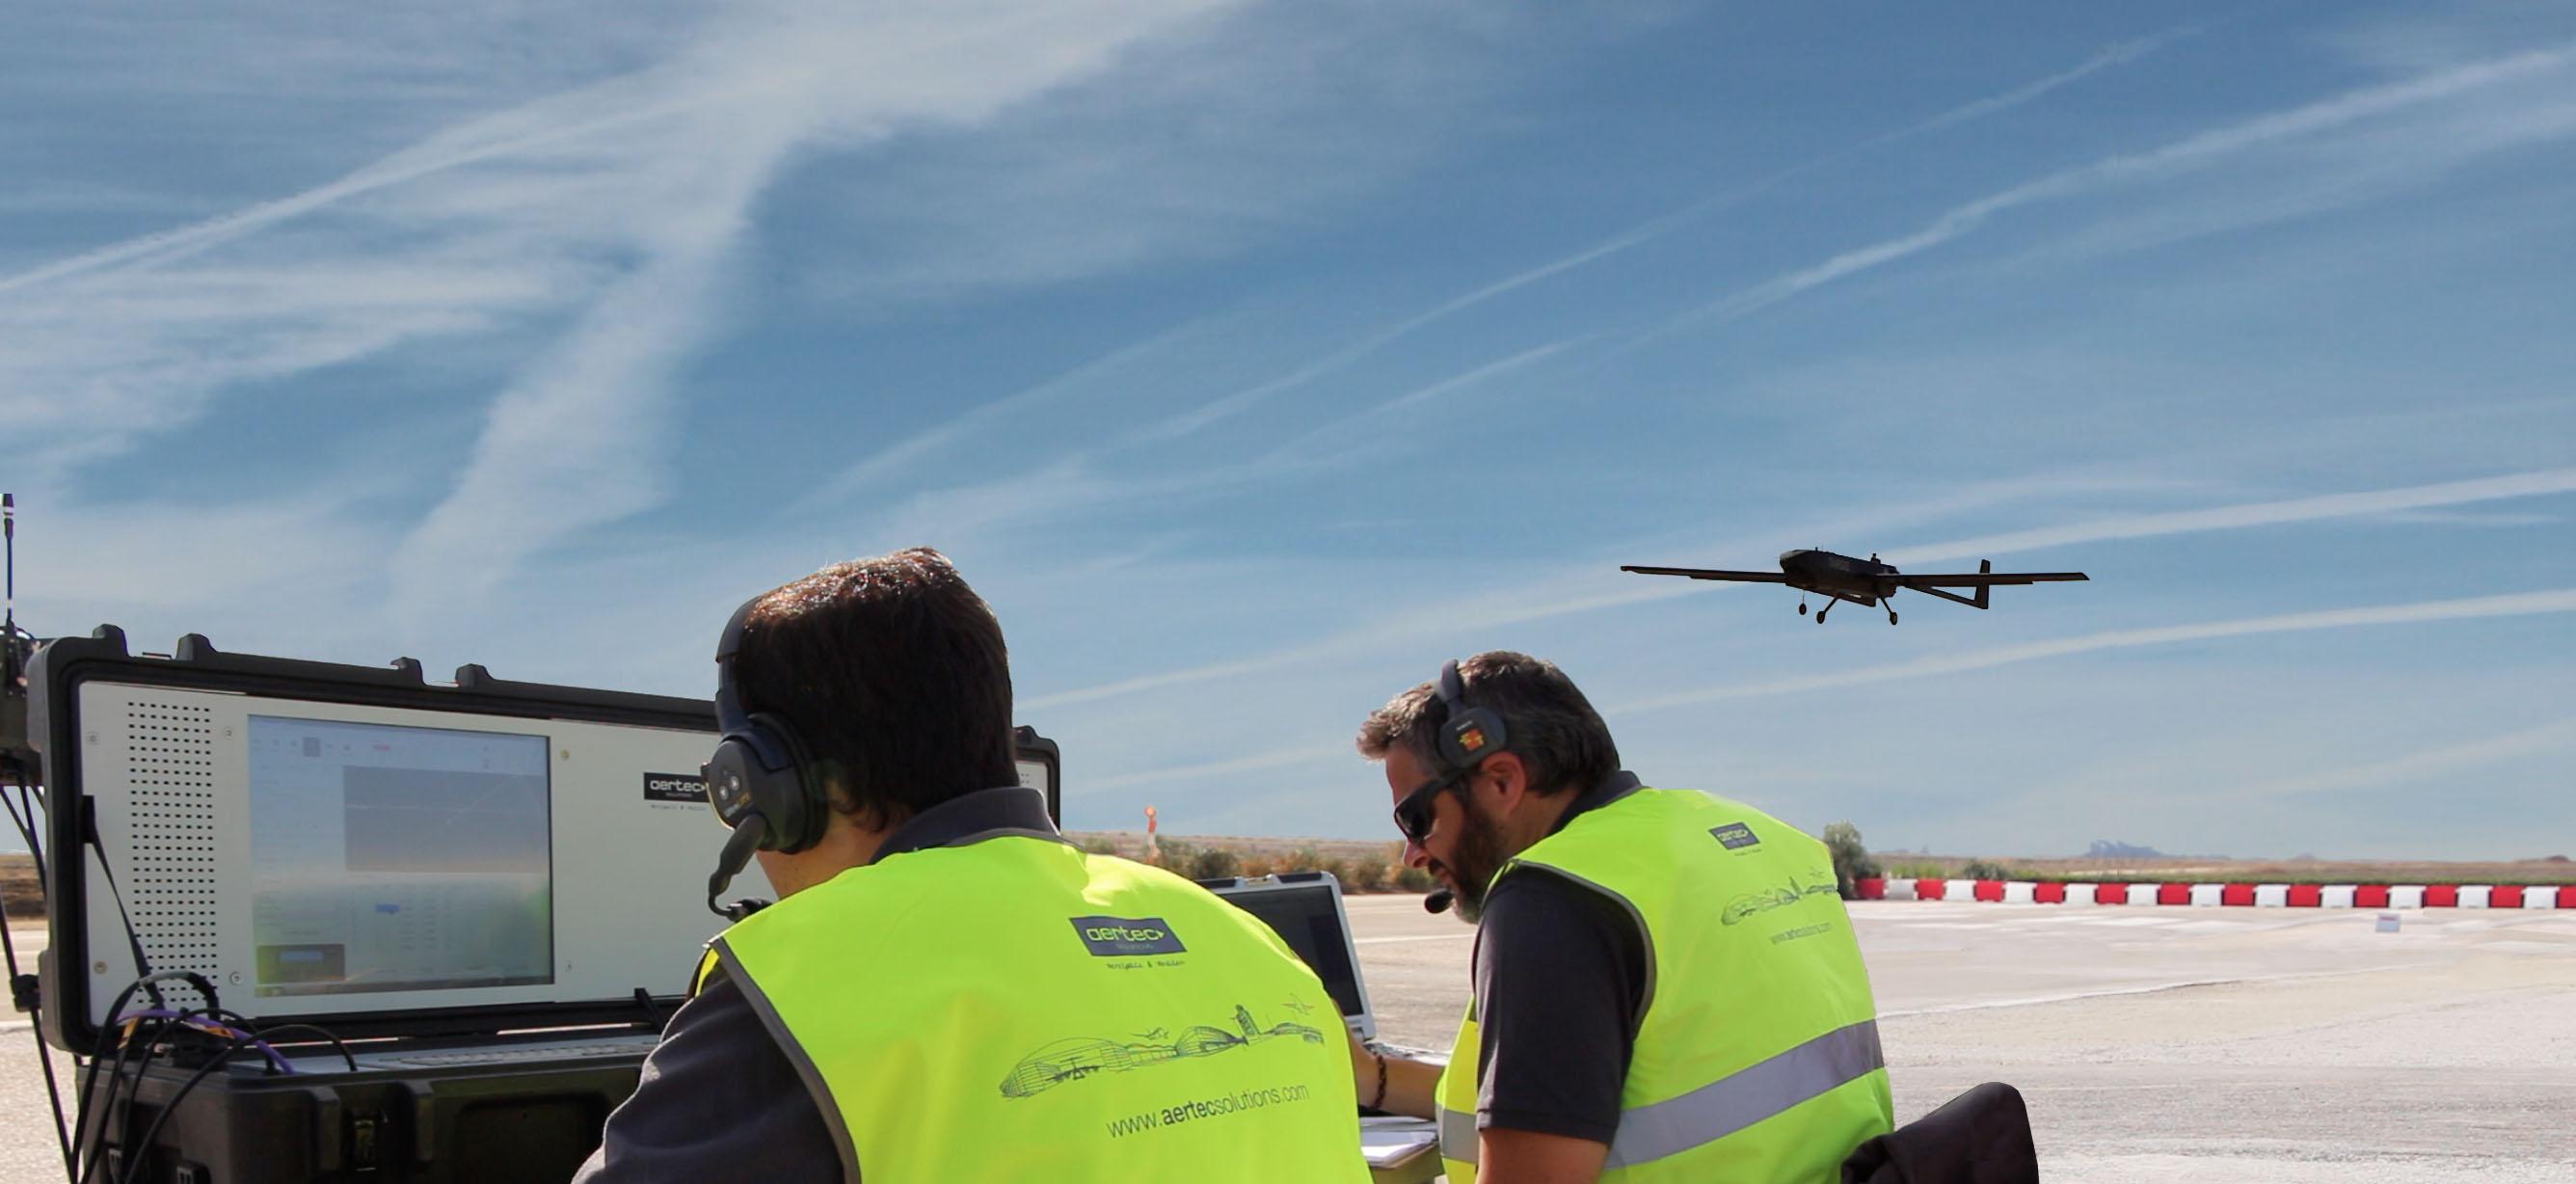 Sistemas aéreos no tripulados RPAS